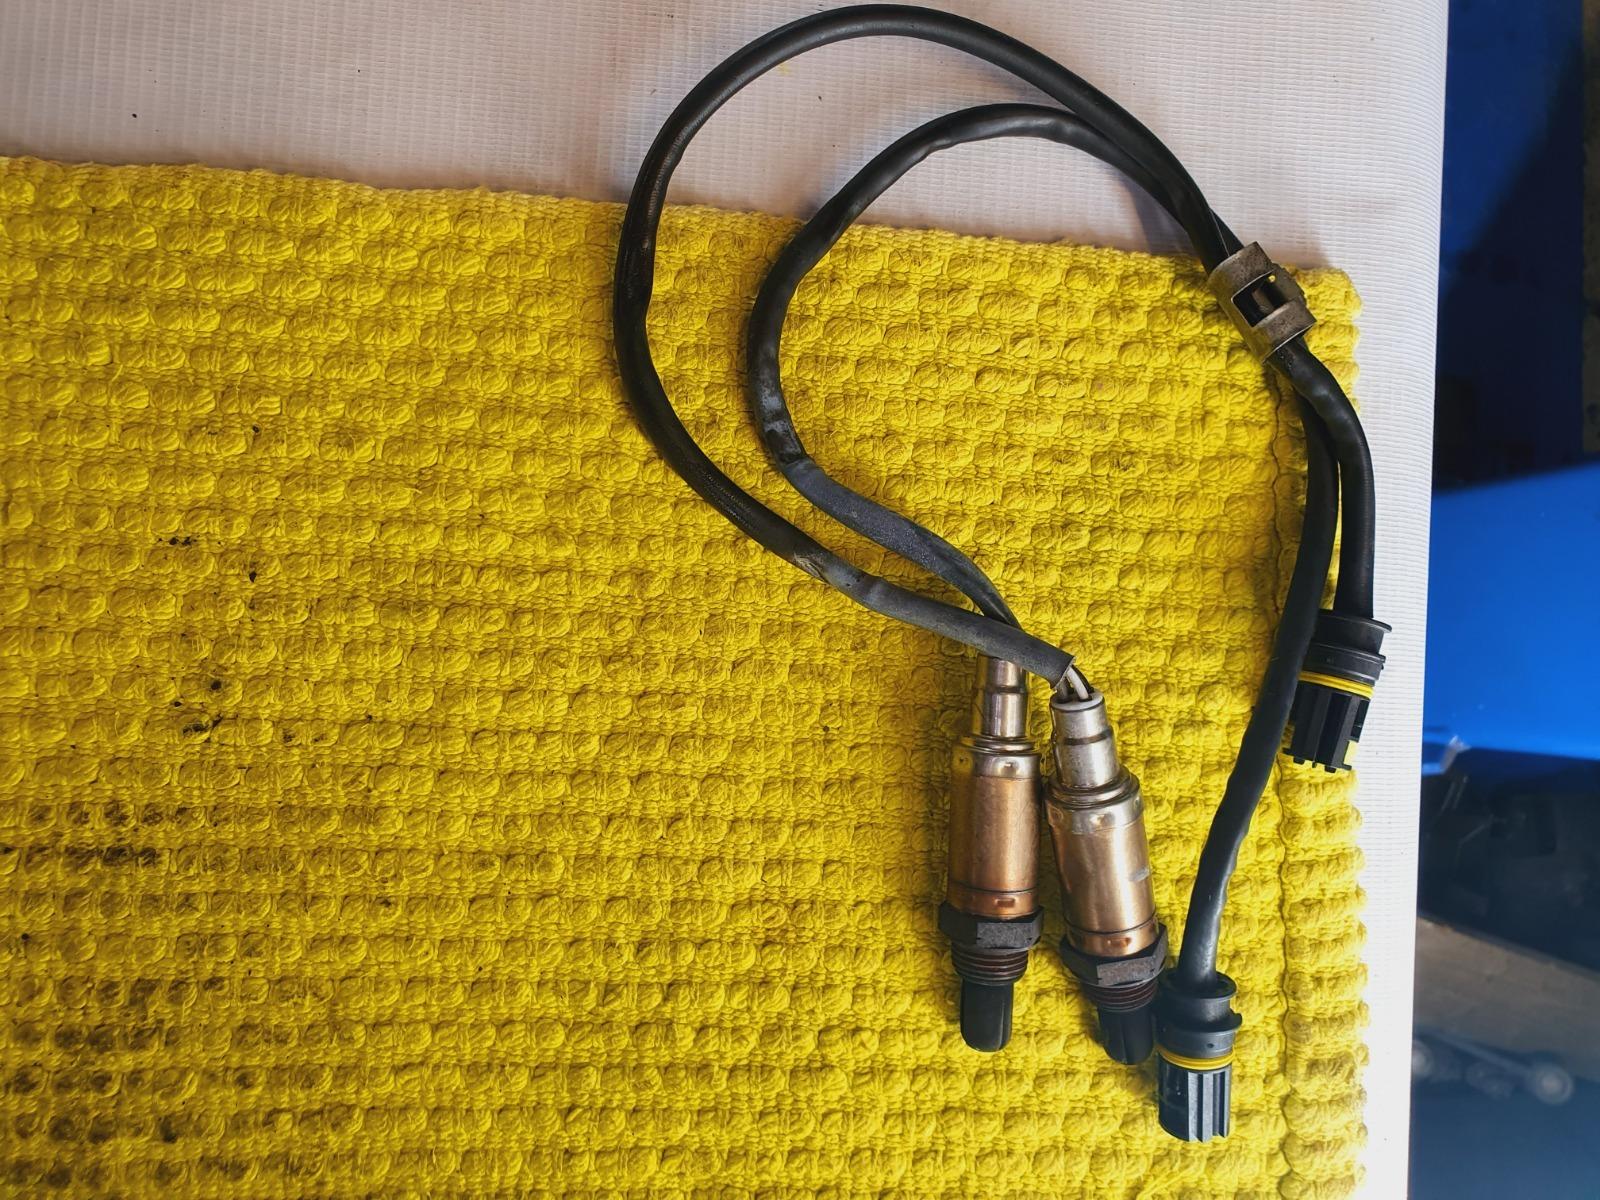 Контролирующий лямбда-зонд Bmw 5-Series E39 E39 M54B30 2002